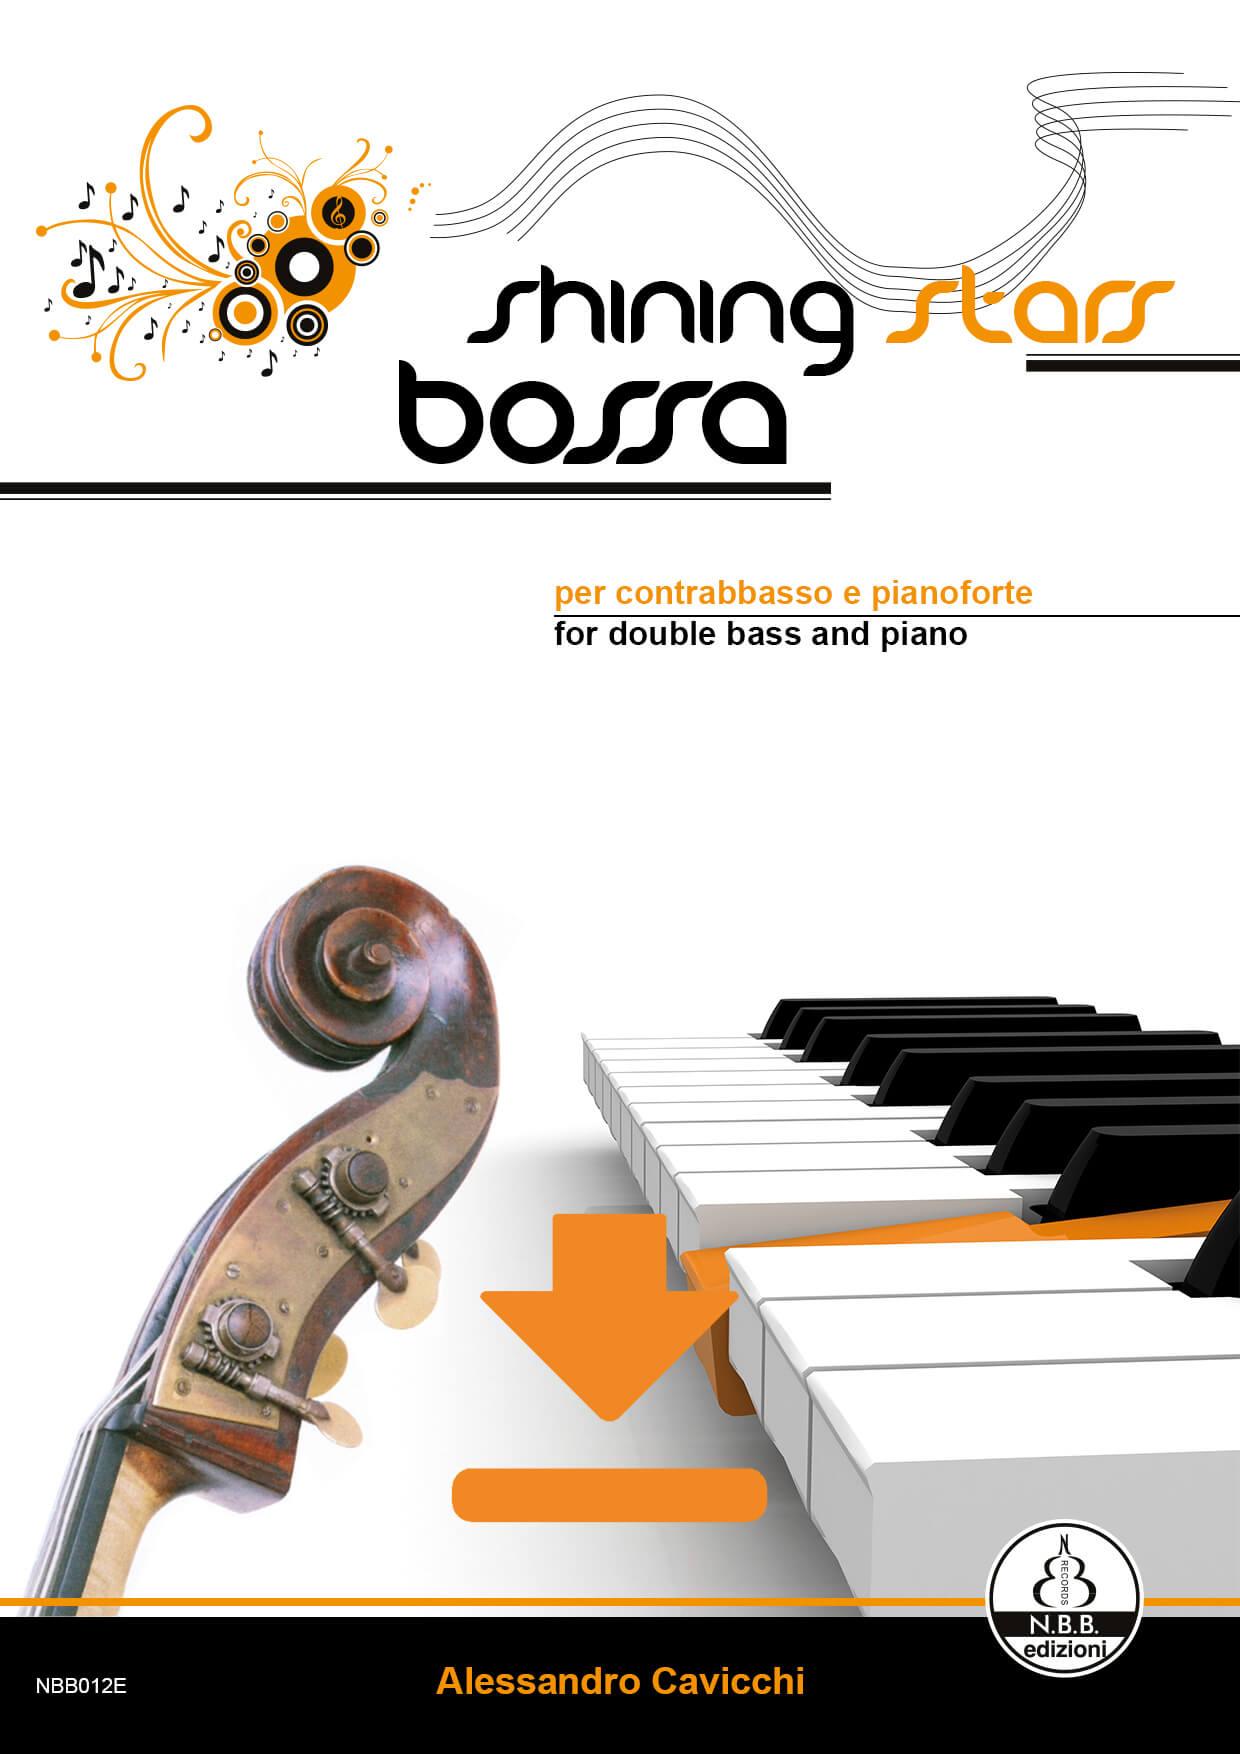 nbbrecords-bossa-pdf-front